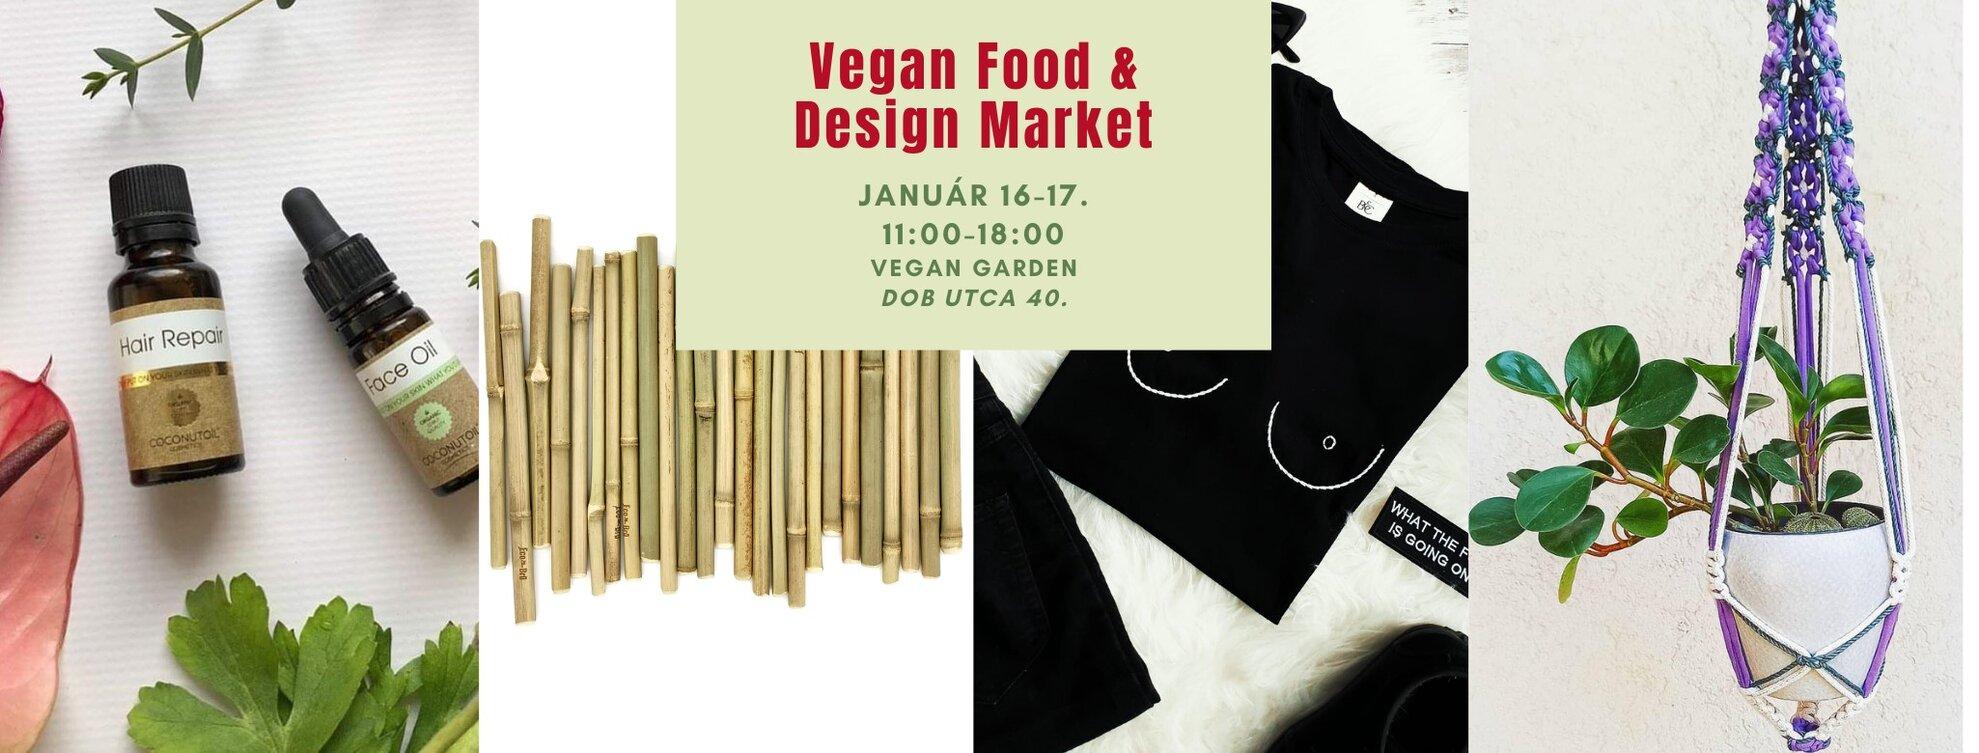 Vegan Food & Design Market